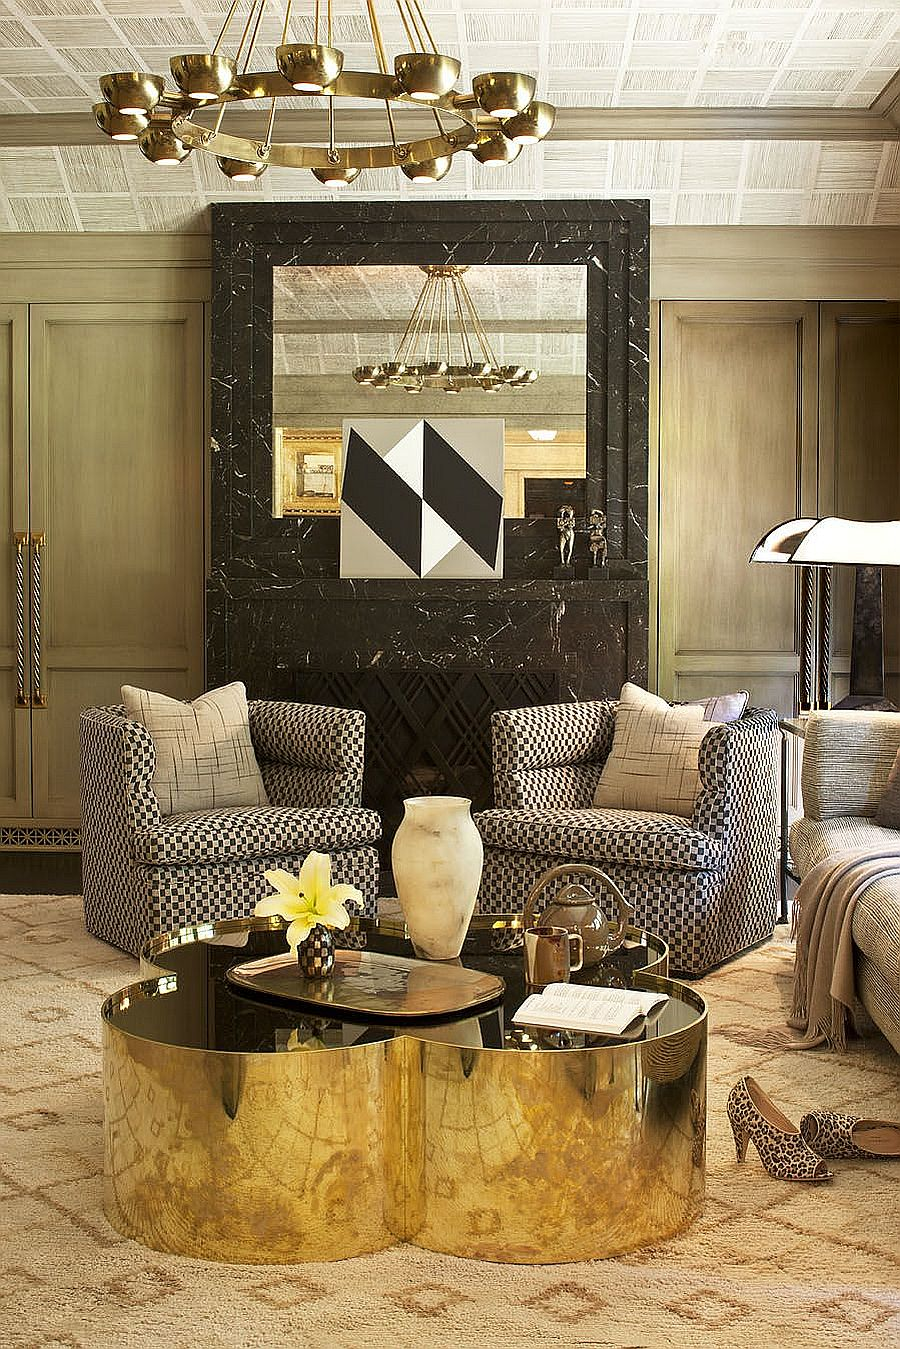 Coffee table brings geometric contrast to the elegant living space [Design: Kelly Wearstler Designs]